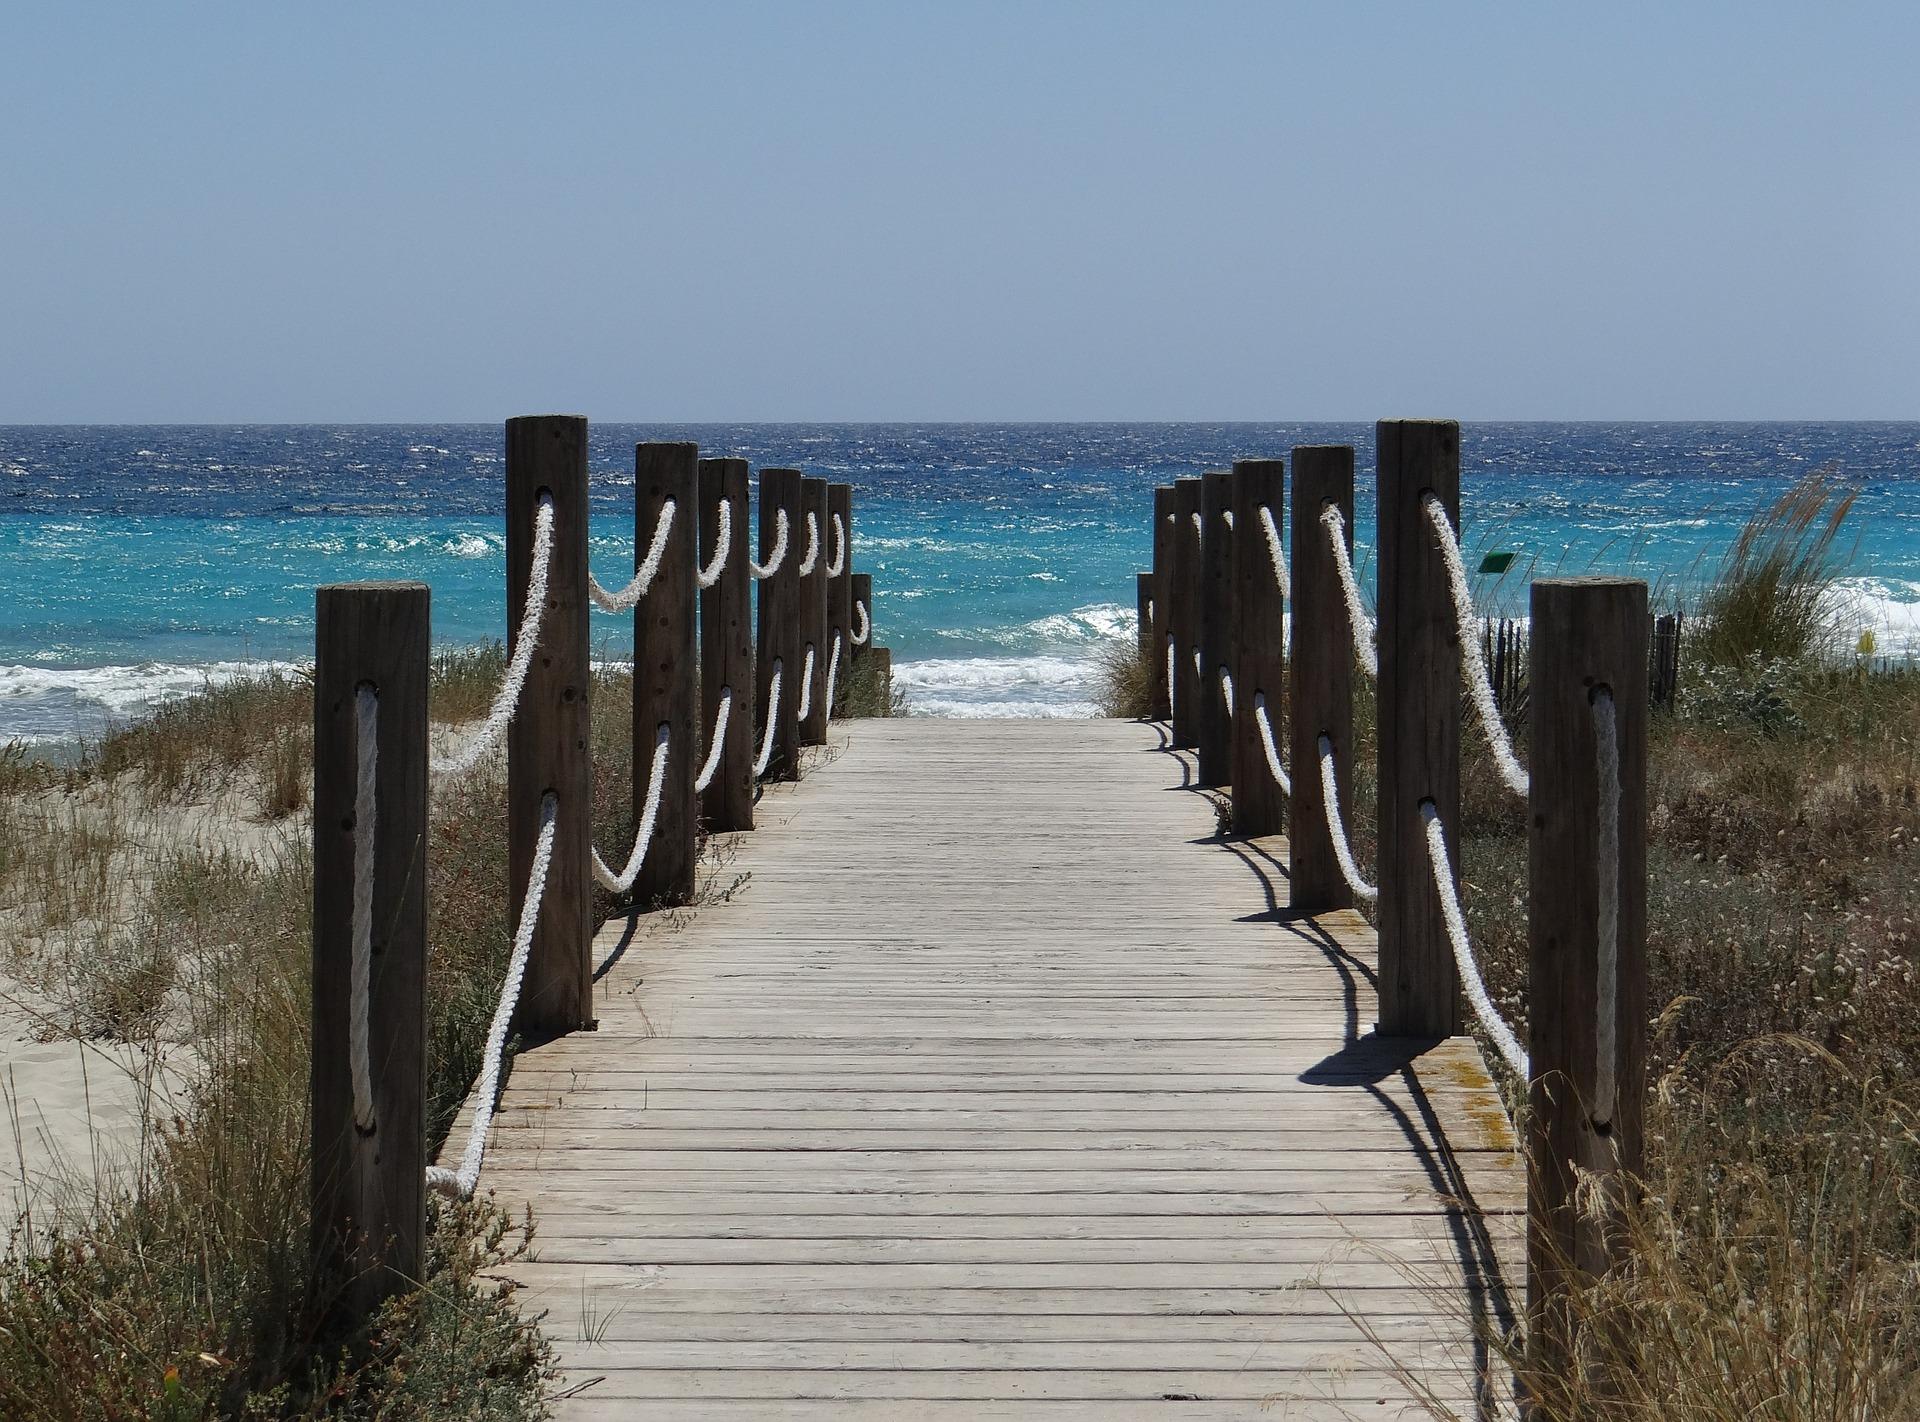 La gran Reserva de la Biosfera del Mediterráneo